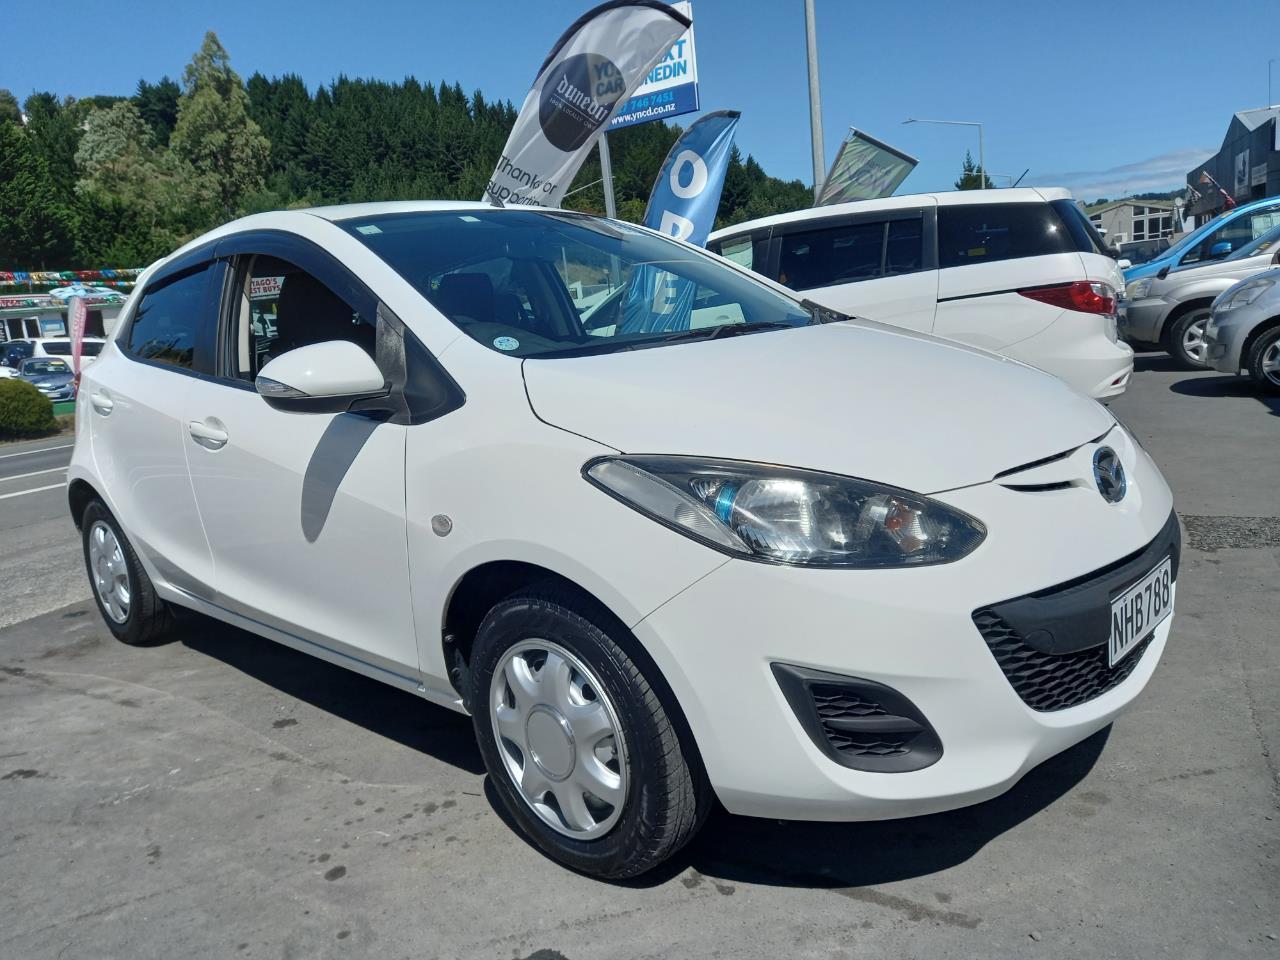 image-4, 2012 Mazda Demio No Deposit Finance at Dunedin